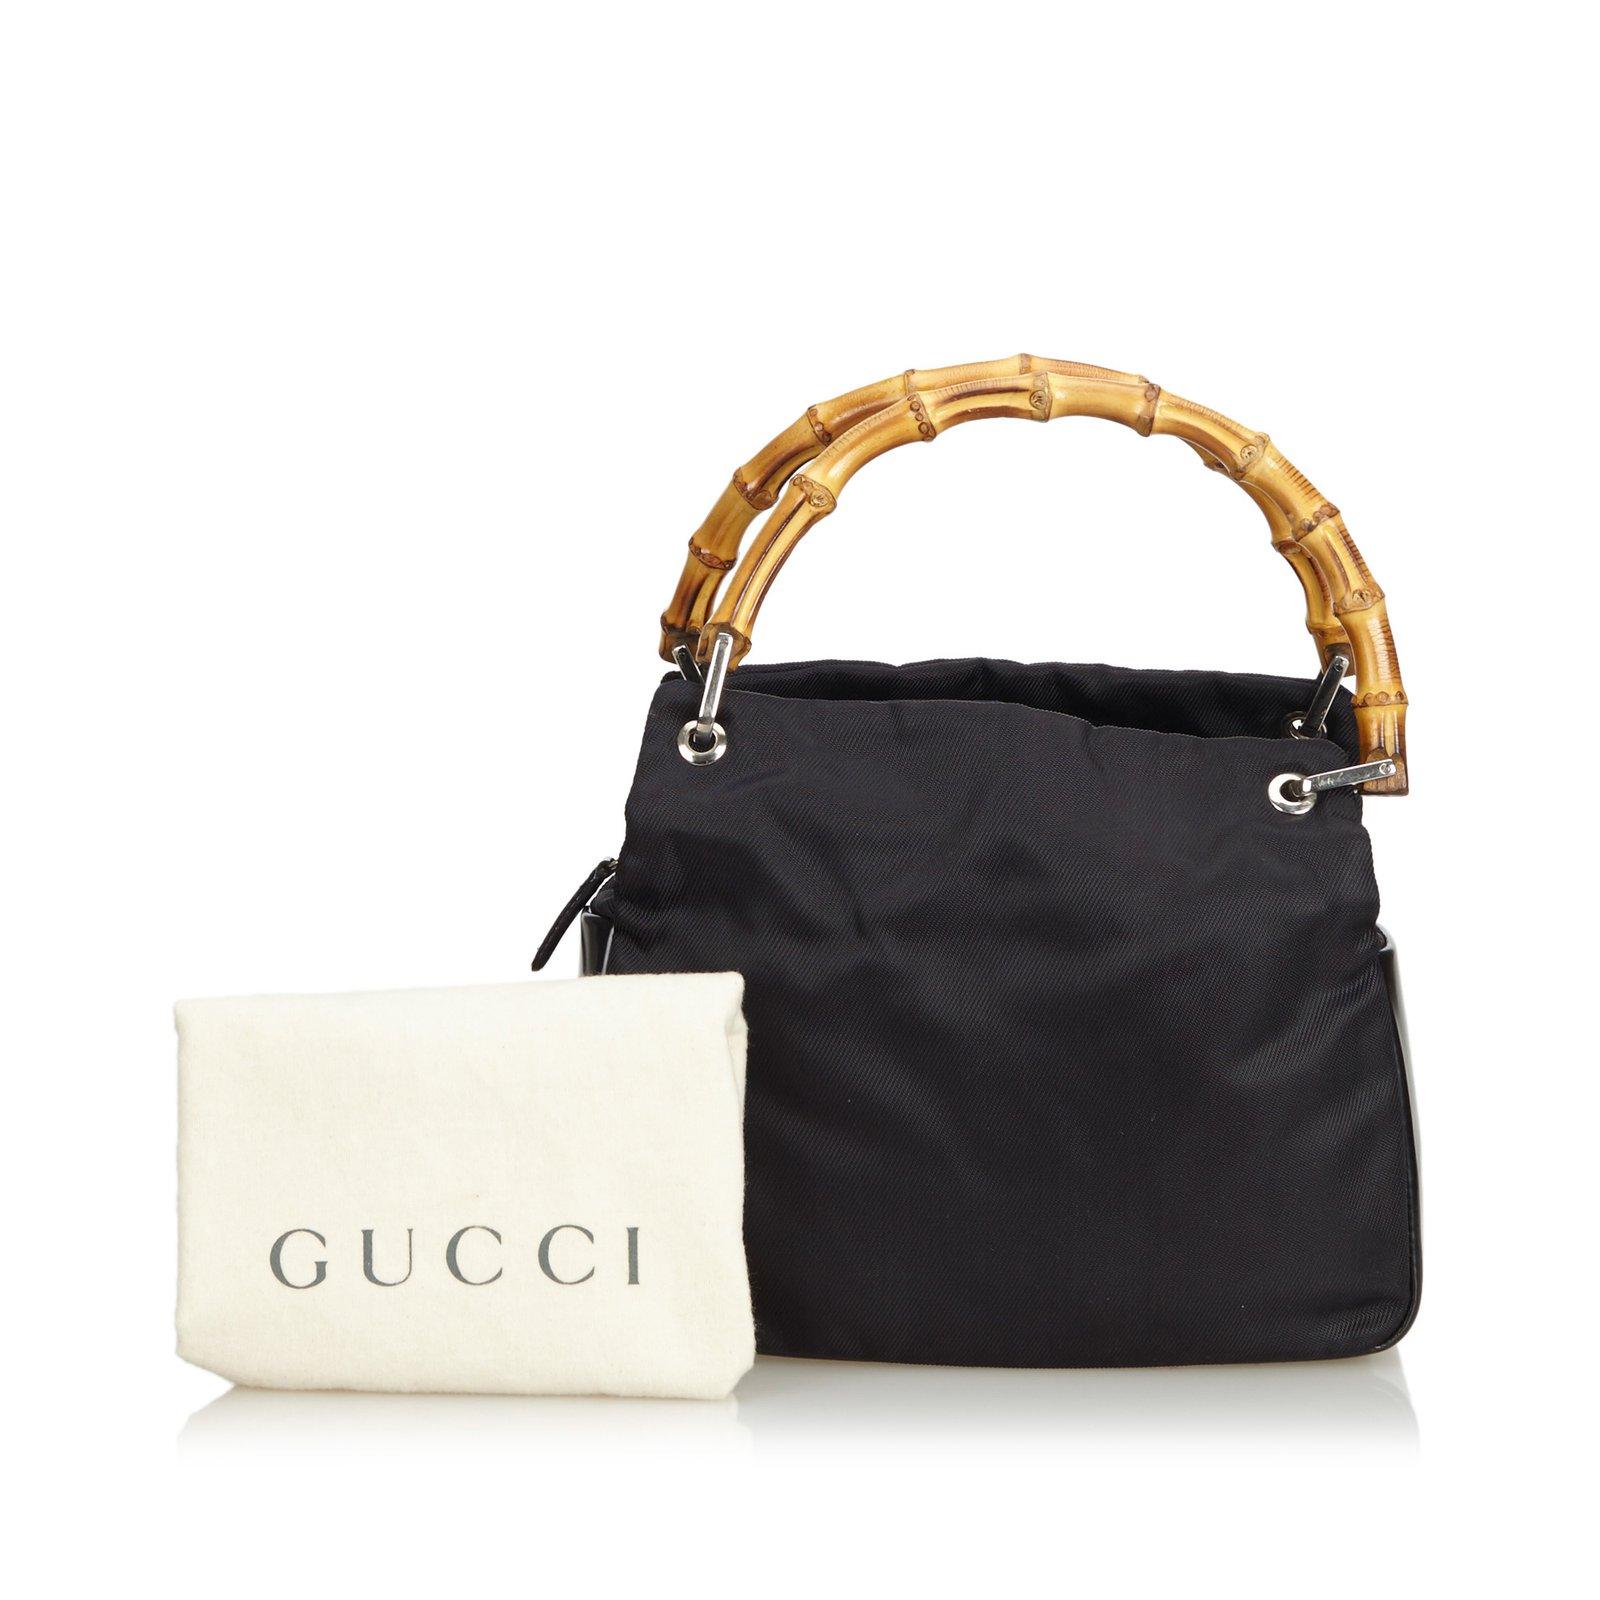 68cc36243fc1 Gucci Bamboo Nylon Handbag Handbags Leather,Other,Nylon,Cloth Black ...